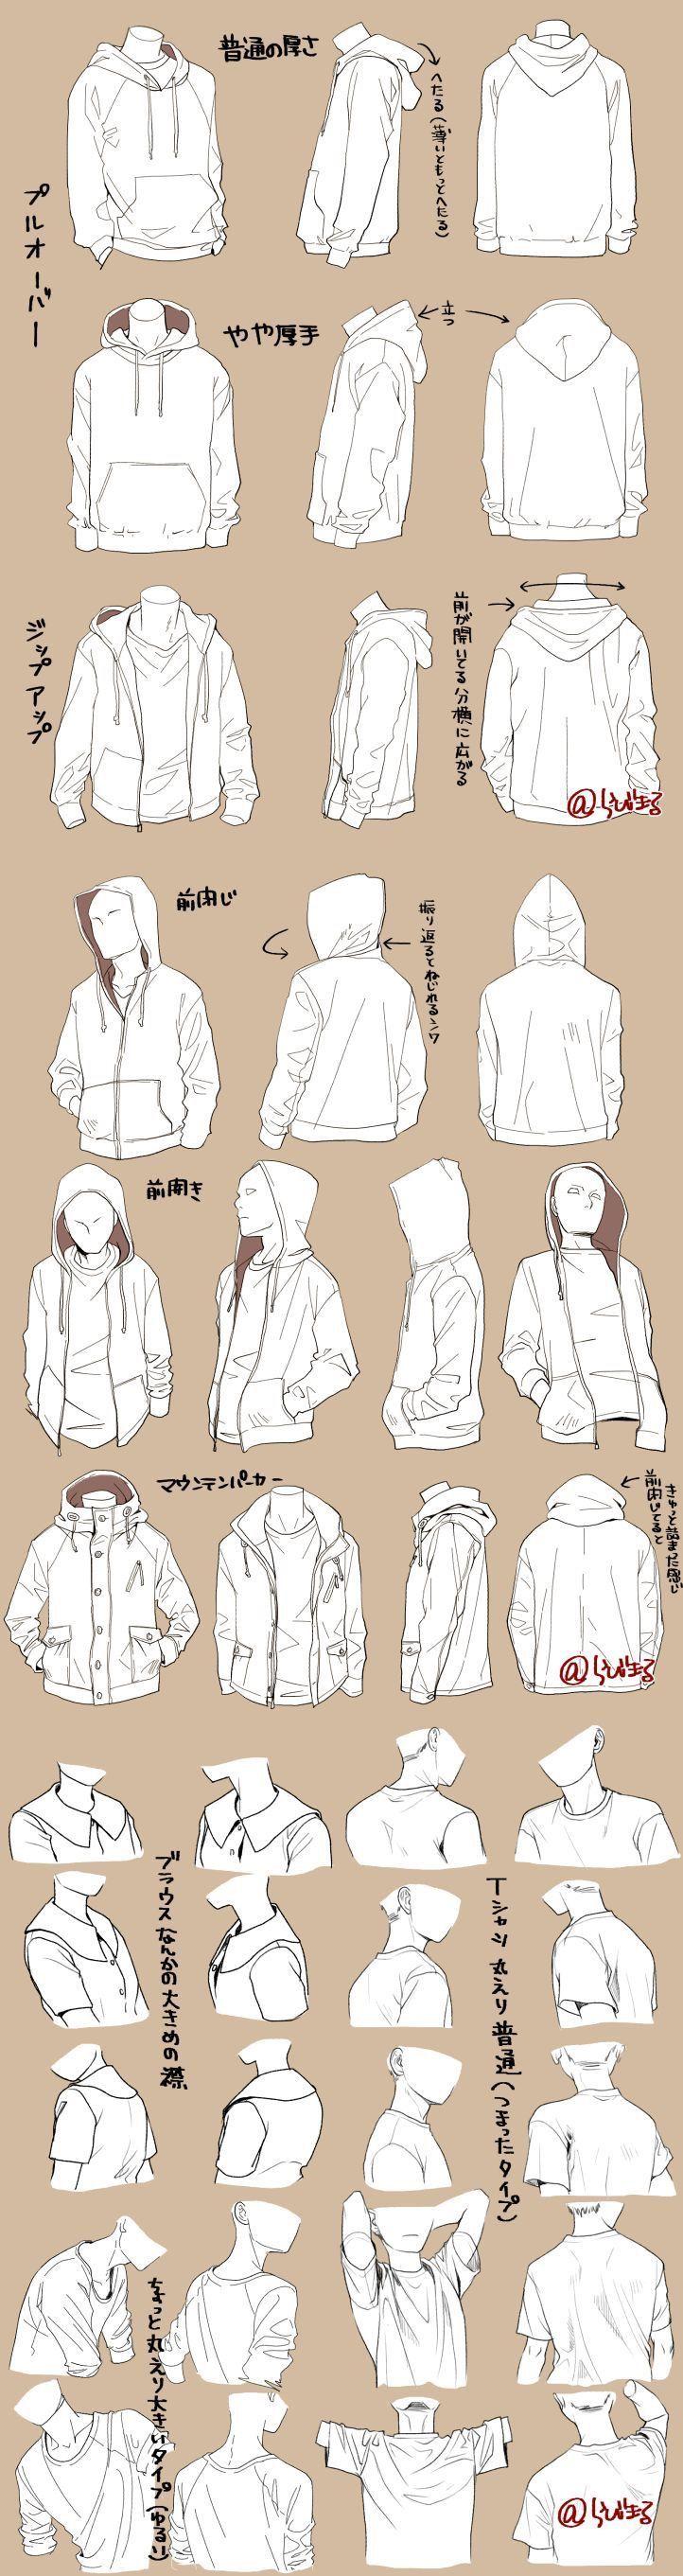 Pin By Squishy Llama On Drawing Tutorials Drawing Clothes Fashion Drawing Clothes